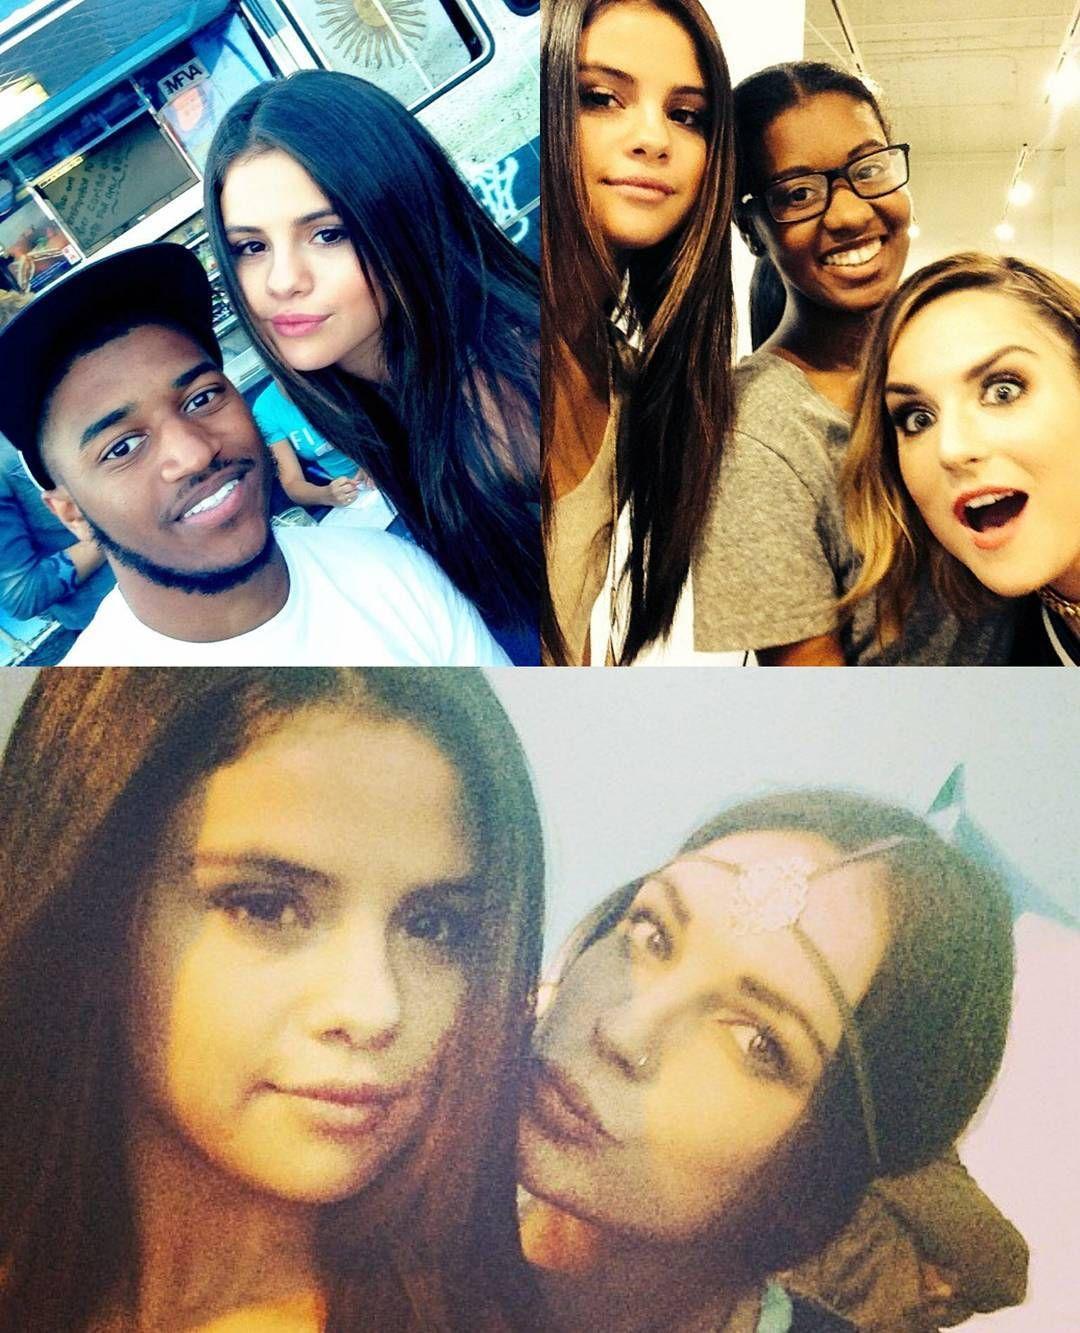 @broccolicity: #TBT ....That time when @selenagomez came to #BCFESTLA @broccolicity: #TBT .... Esa vez cuando @selenagomez llegó a #BCFESTLA  #SelenaGomez #Selena #Selenator #Fans | #BestFanArmy #Selenators #iHeartAwards